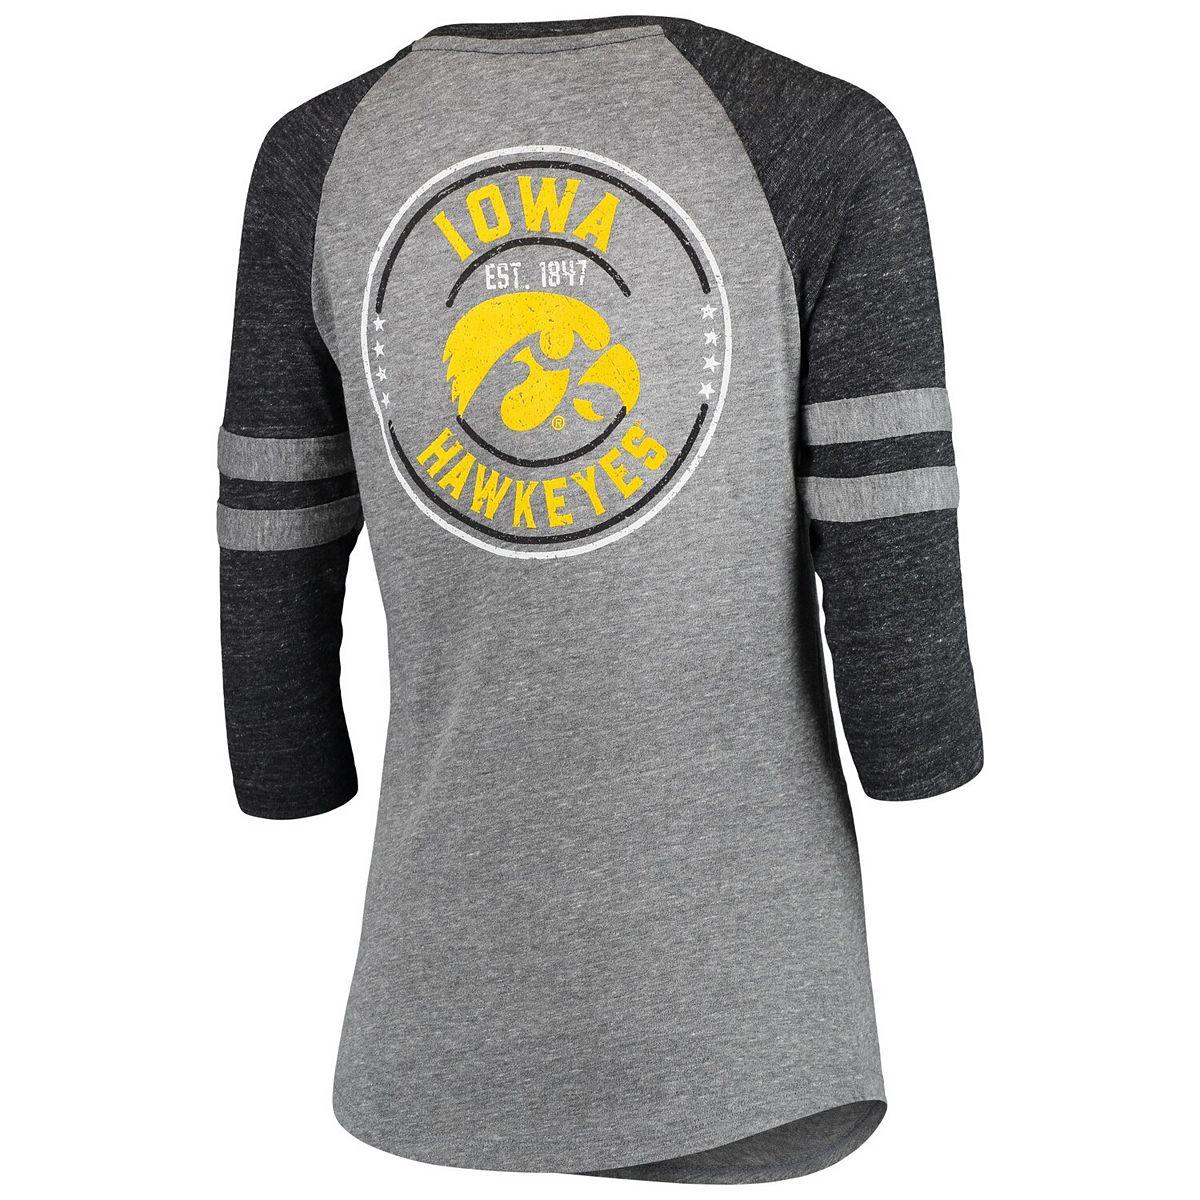 Women's 5th & Ocean by New Era Heathered Gray/Black Iowa Hawkeyes Lace Up 3/4-Sleeve Tri-Blend T-Shirt RaEWn